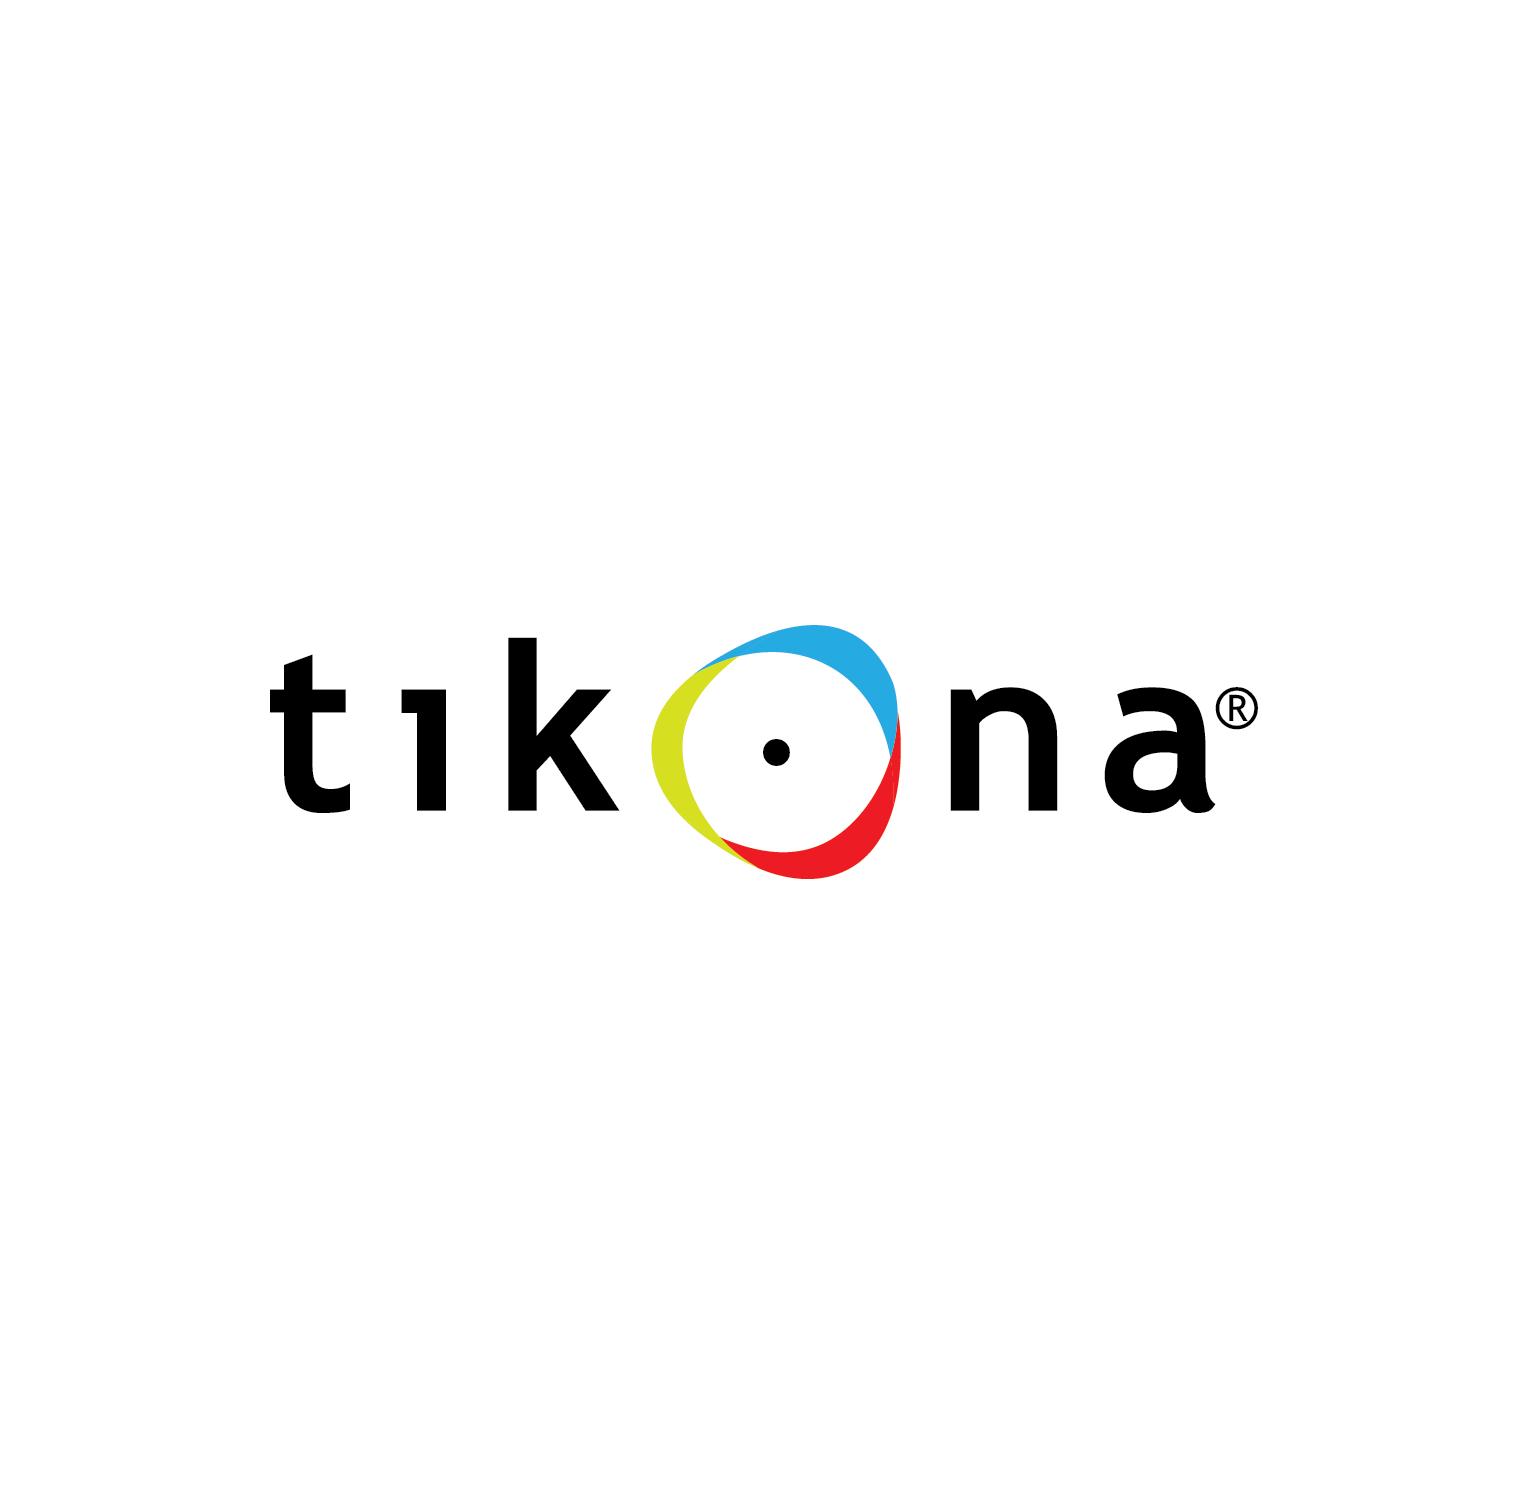 tikona customer care toll free number chennai